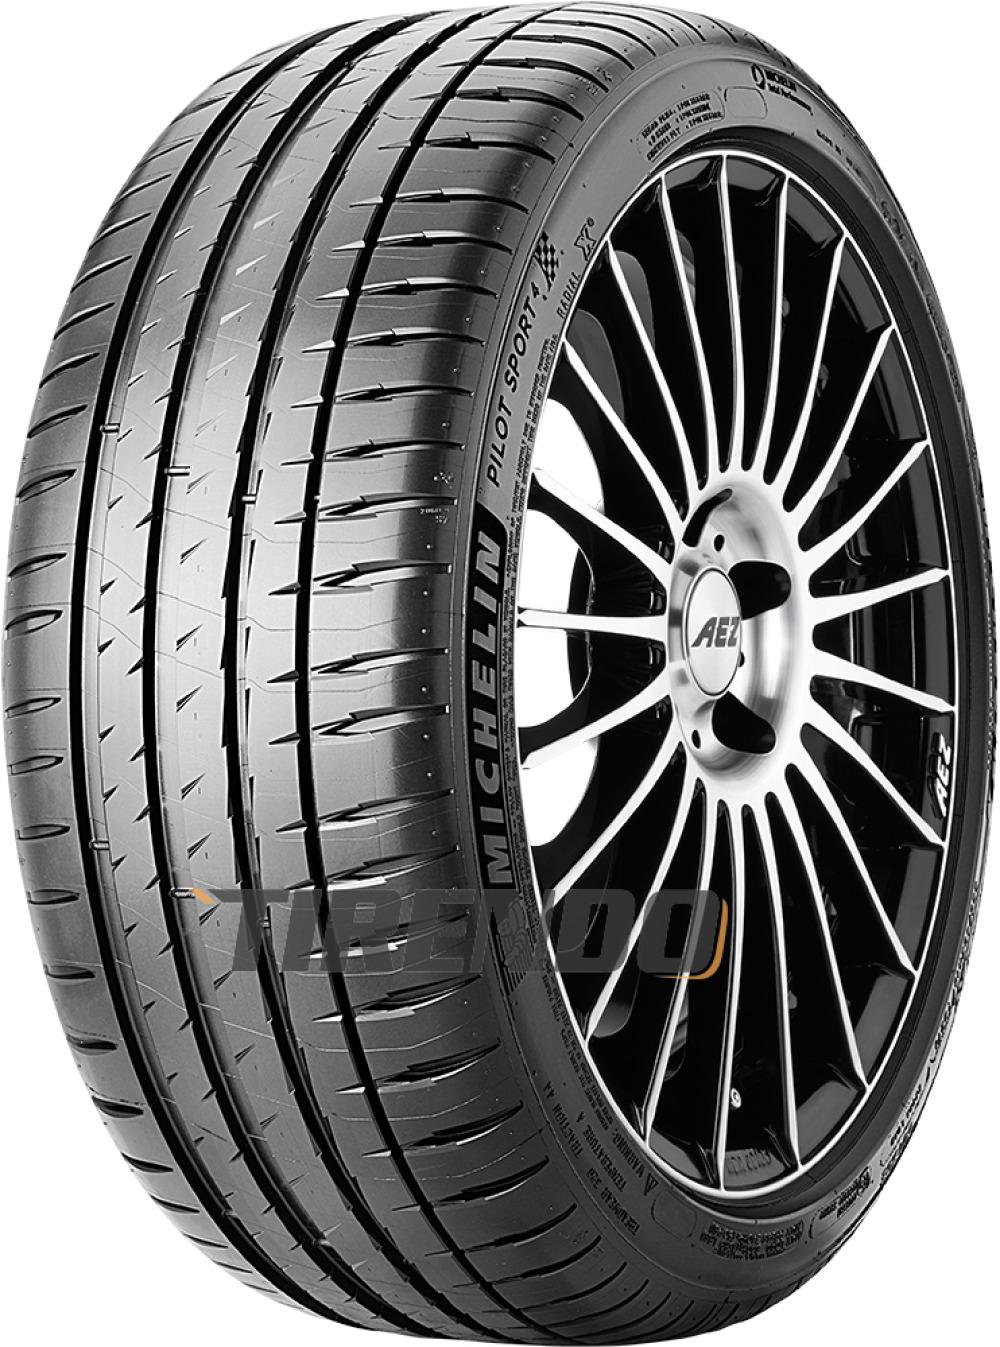 Michelin Pilot Sport 4 ( 315/30 ZR21 (105Y) XL Acoustic, N0 )